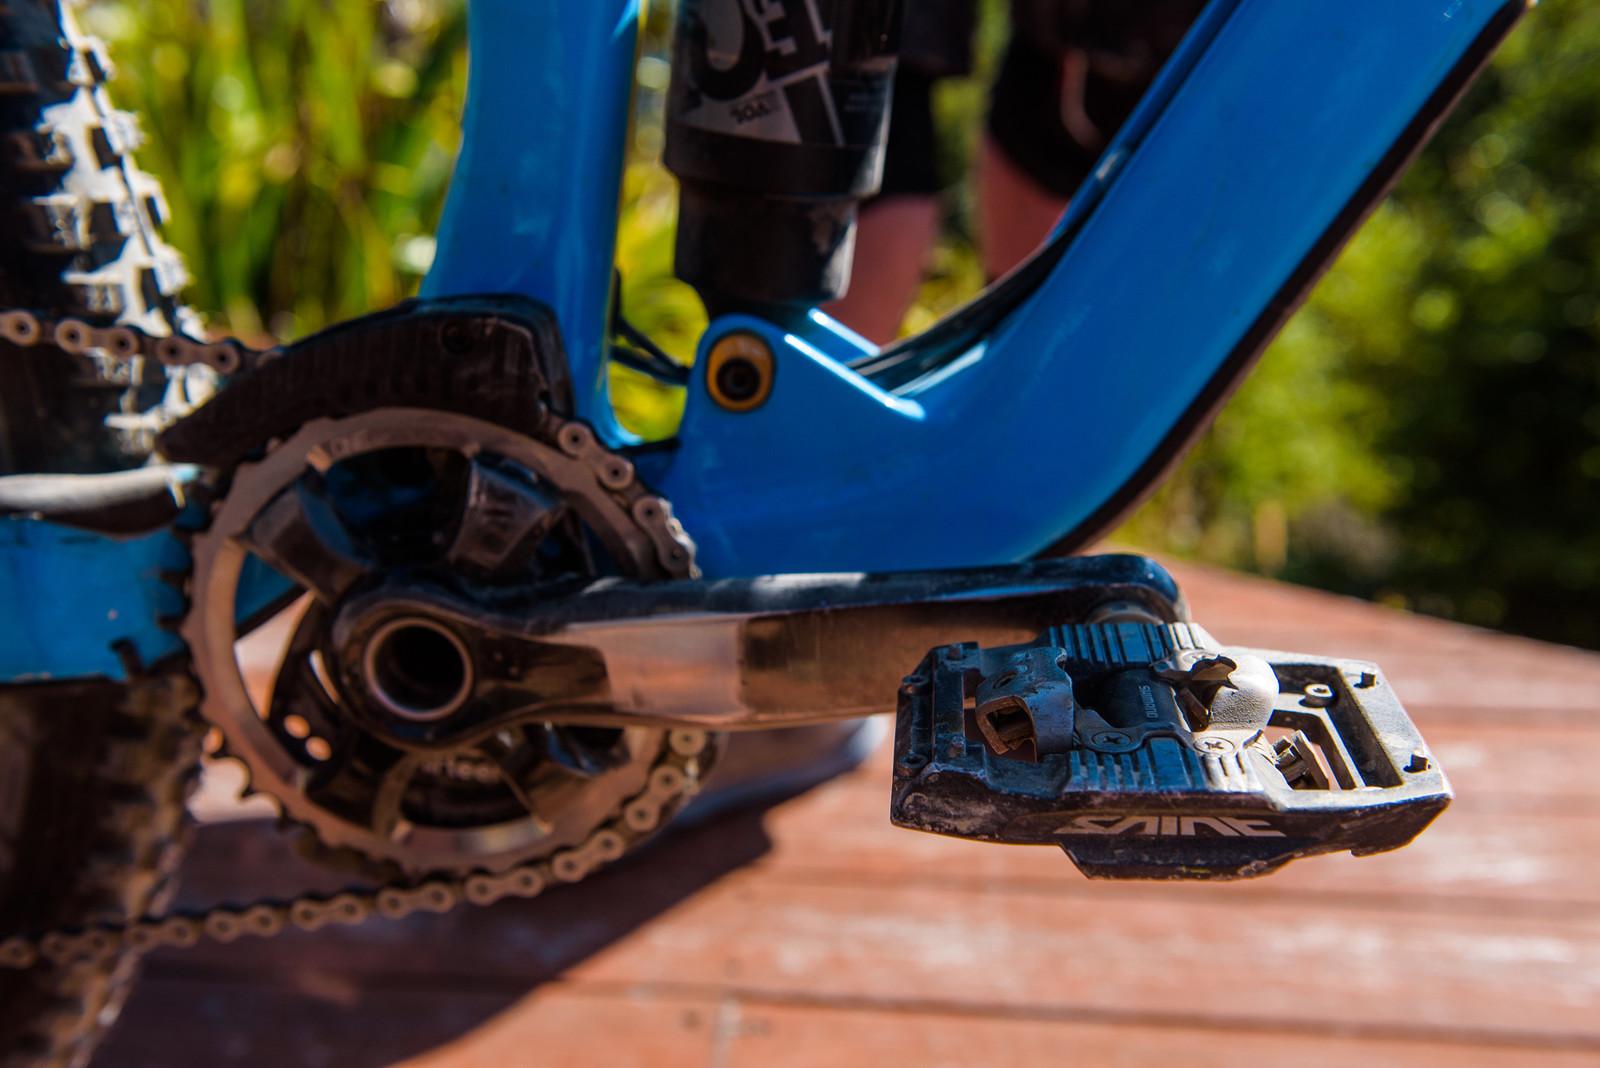 Shimano Saint Pedals - Pro Bike - Wyn Masters' GT Force, Size XL - Mountain Biking Pictures - Vital MTB